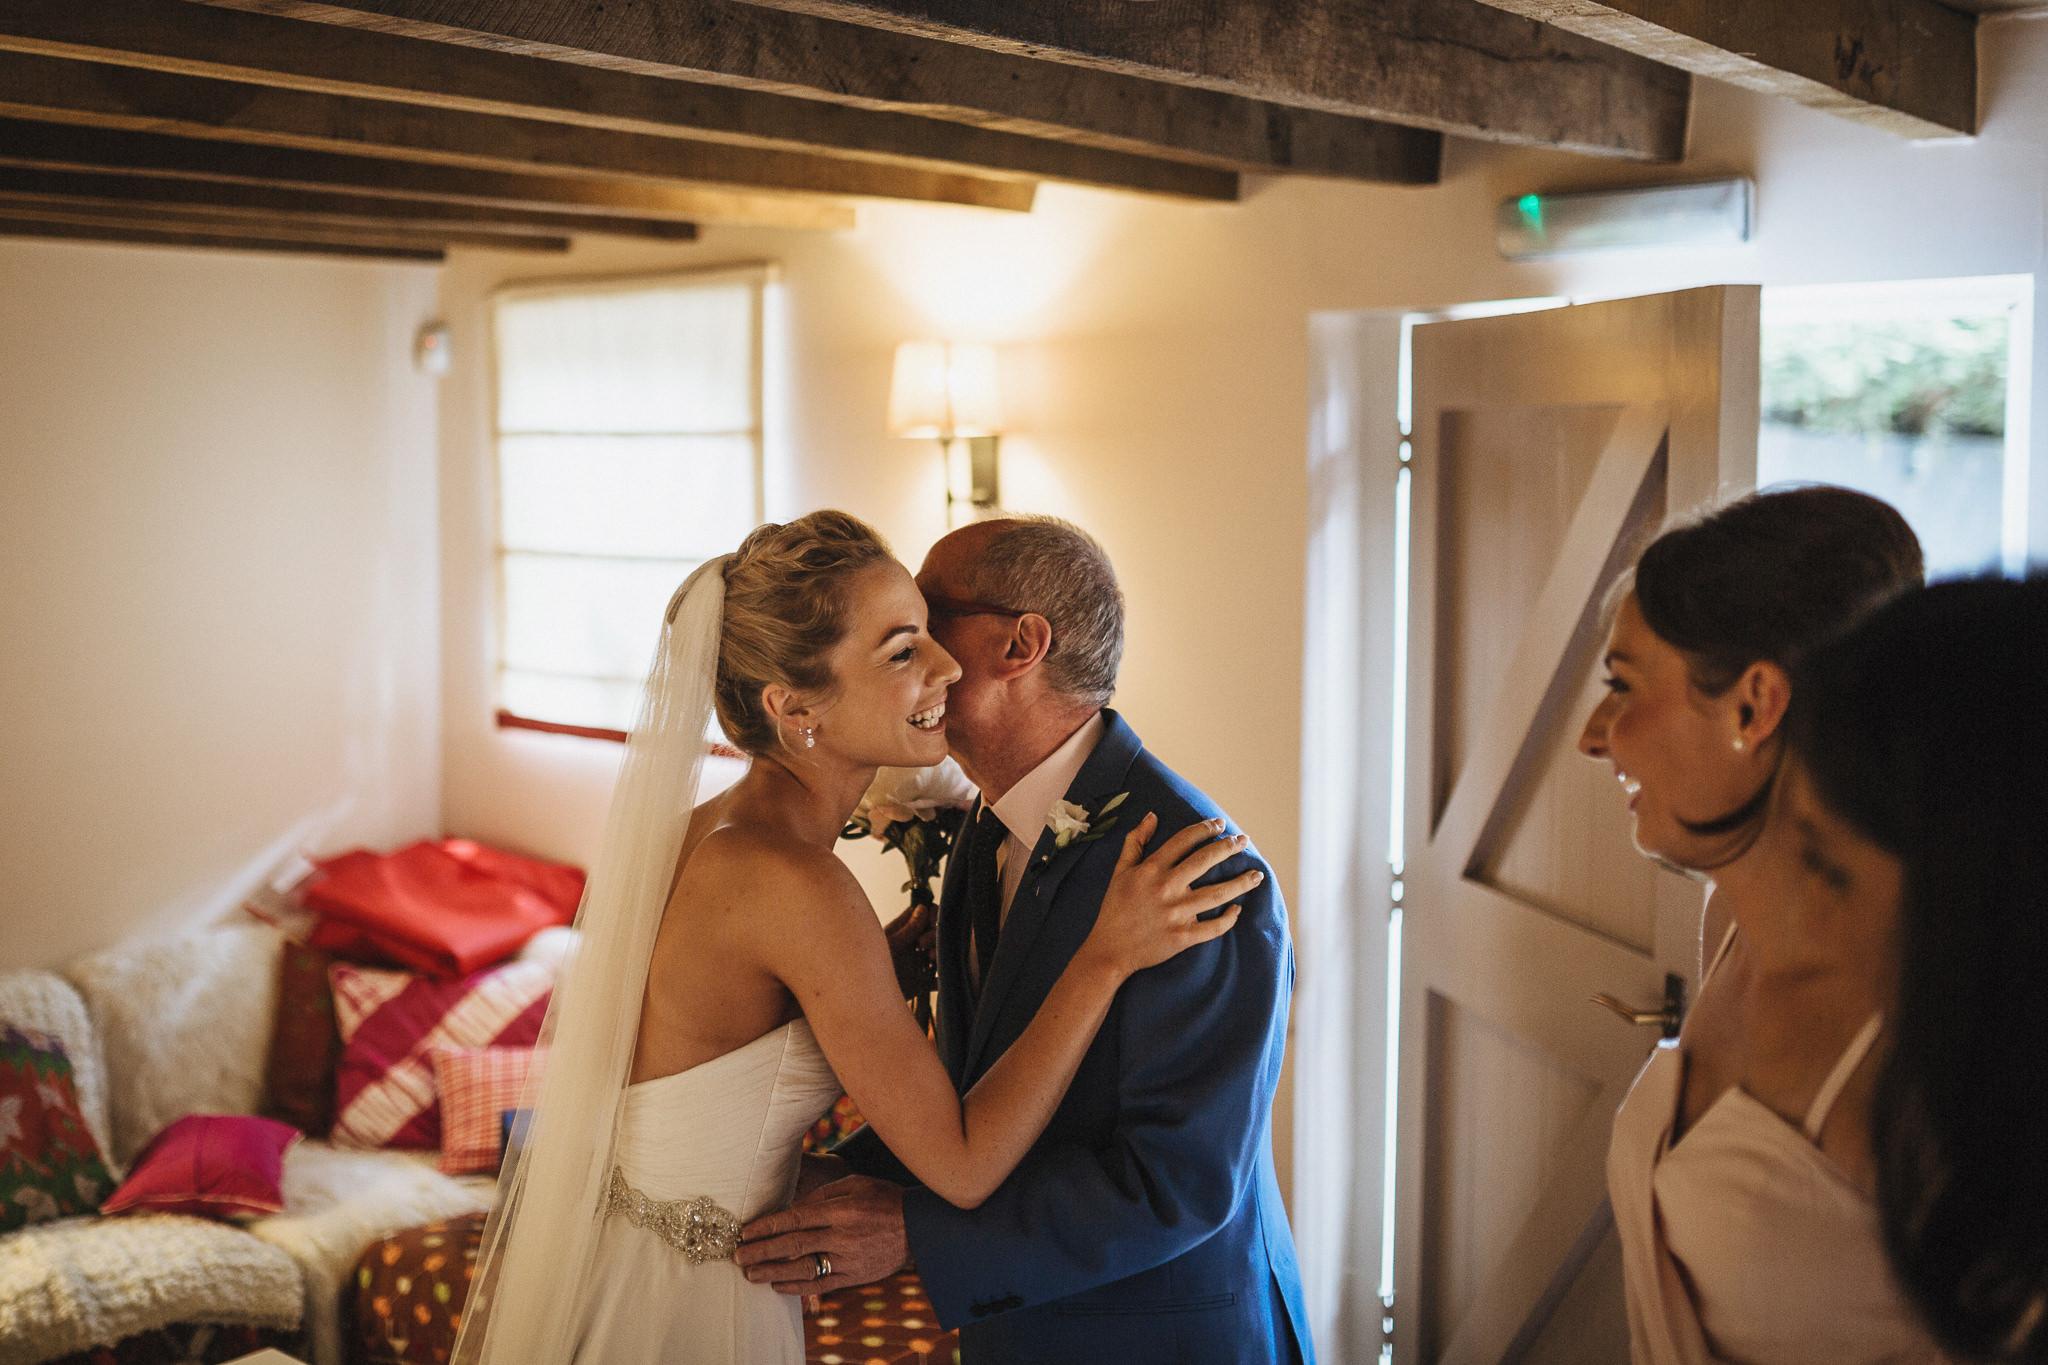 paul-marbrook-Gaynes-Park Wedding-Photographer-90032